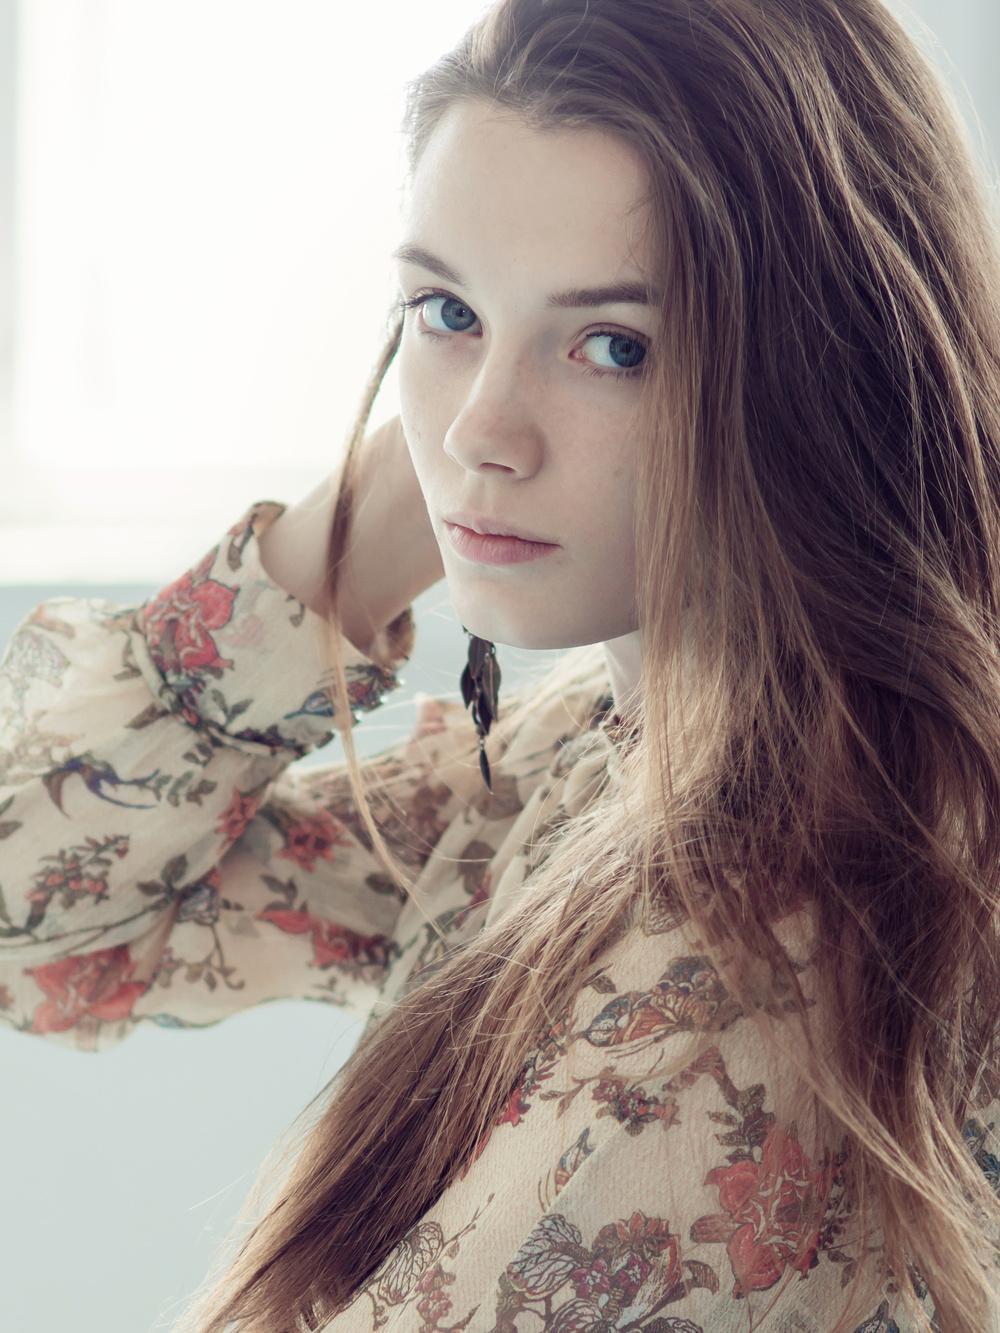 Marina Ershova